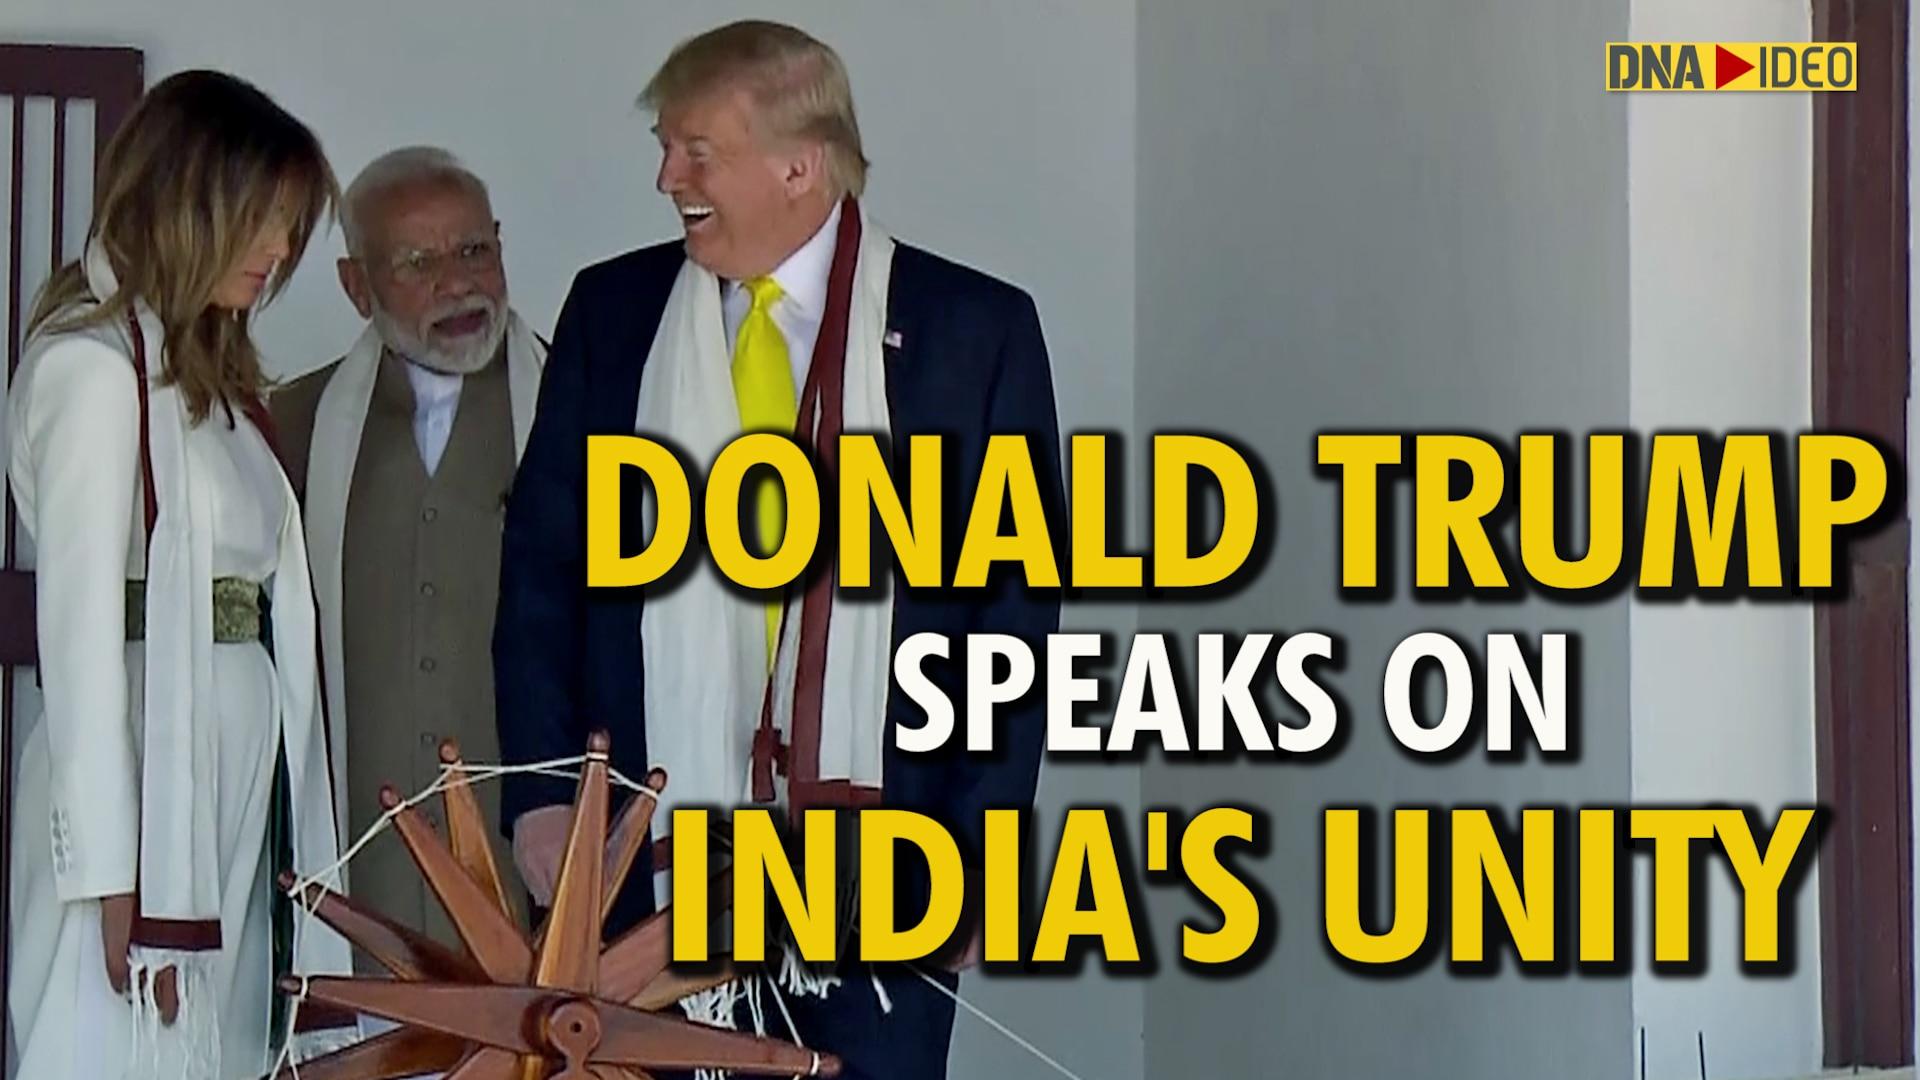 Watch US President Donald Trump speaking about Swami Vivekananda, India's Unity, Chandrayaan 2